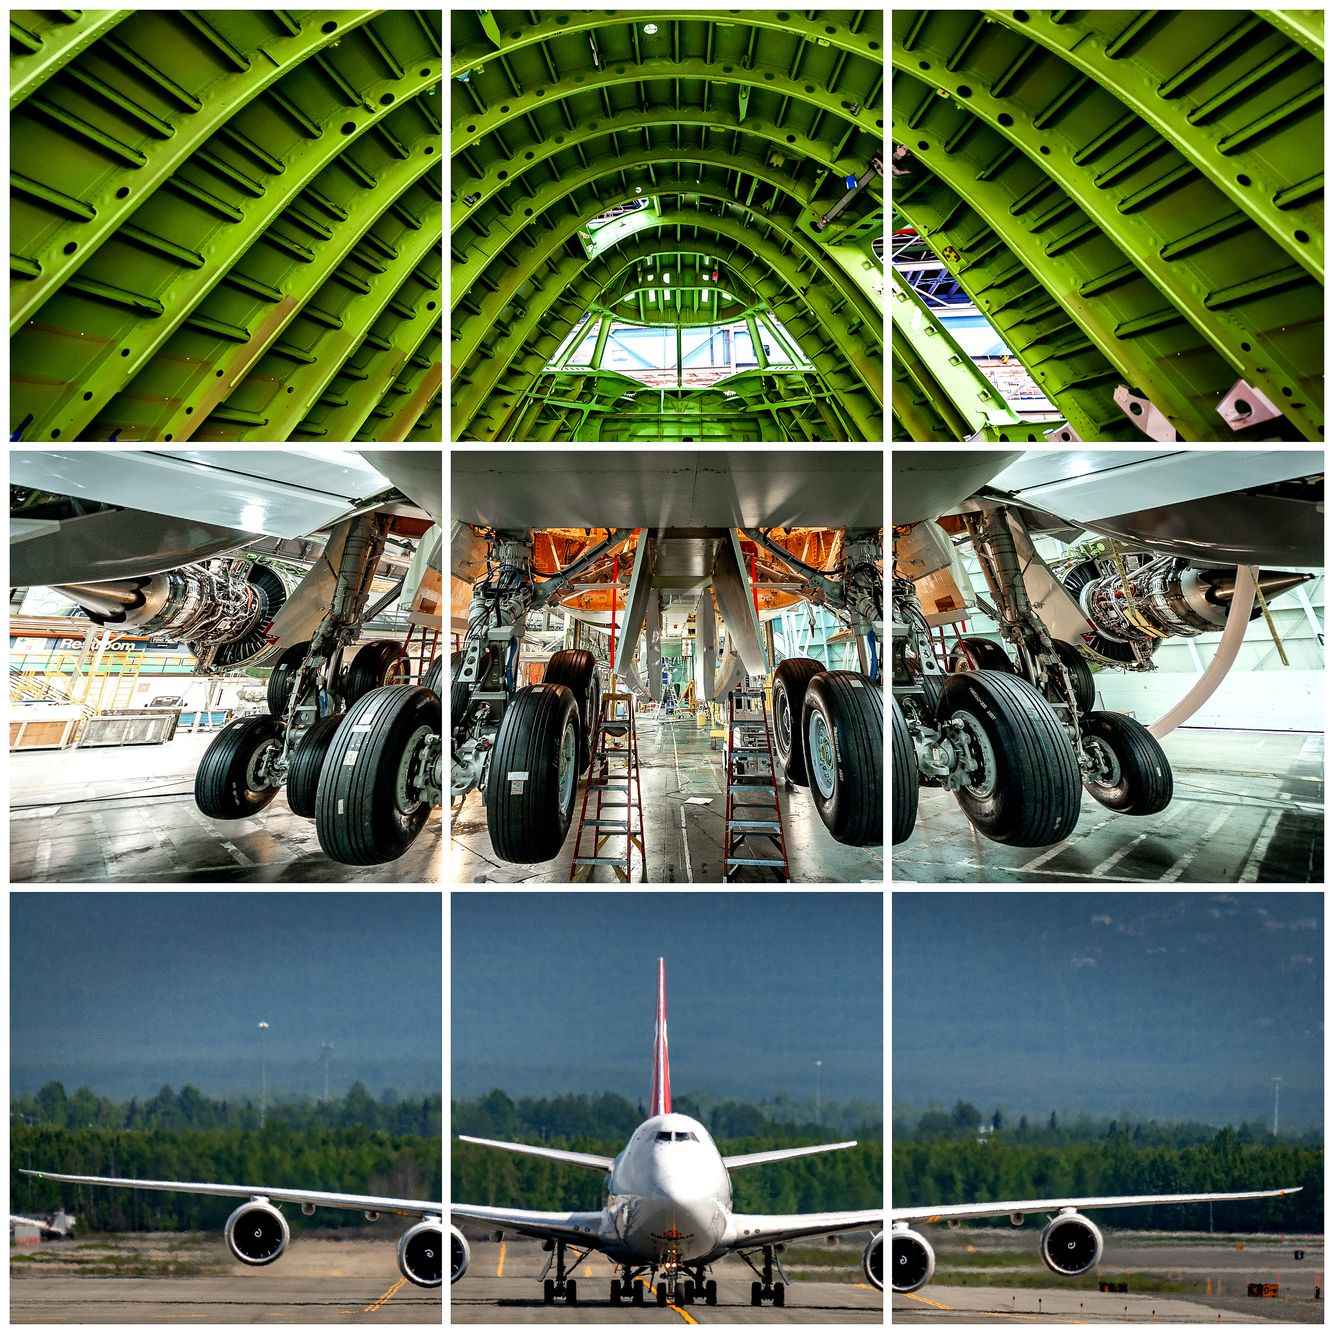 plane_001 copy.jpg